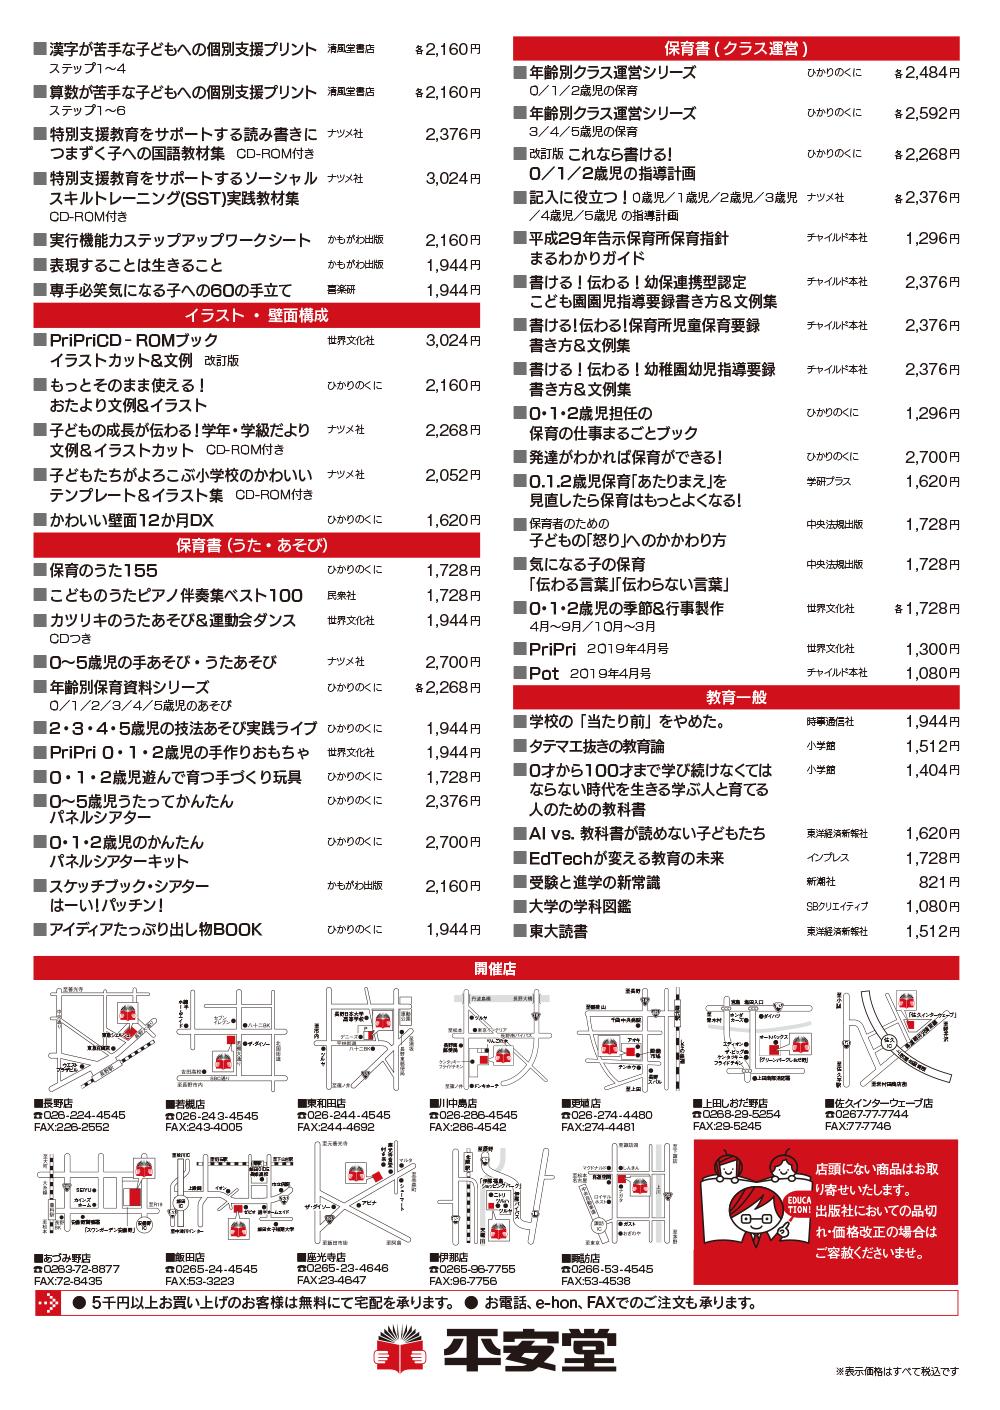 kyoiku2019-2